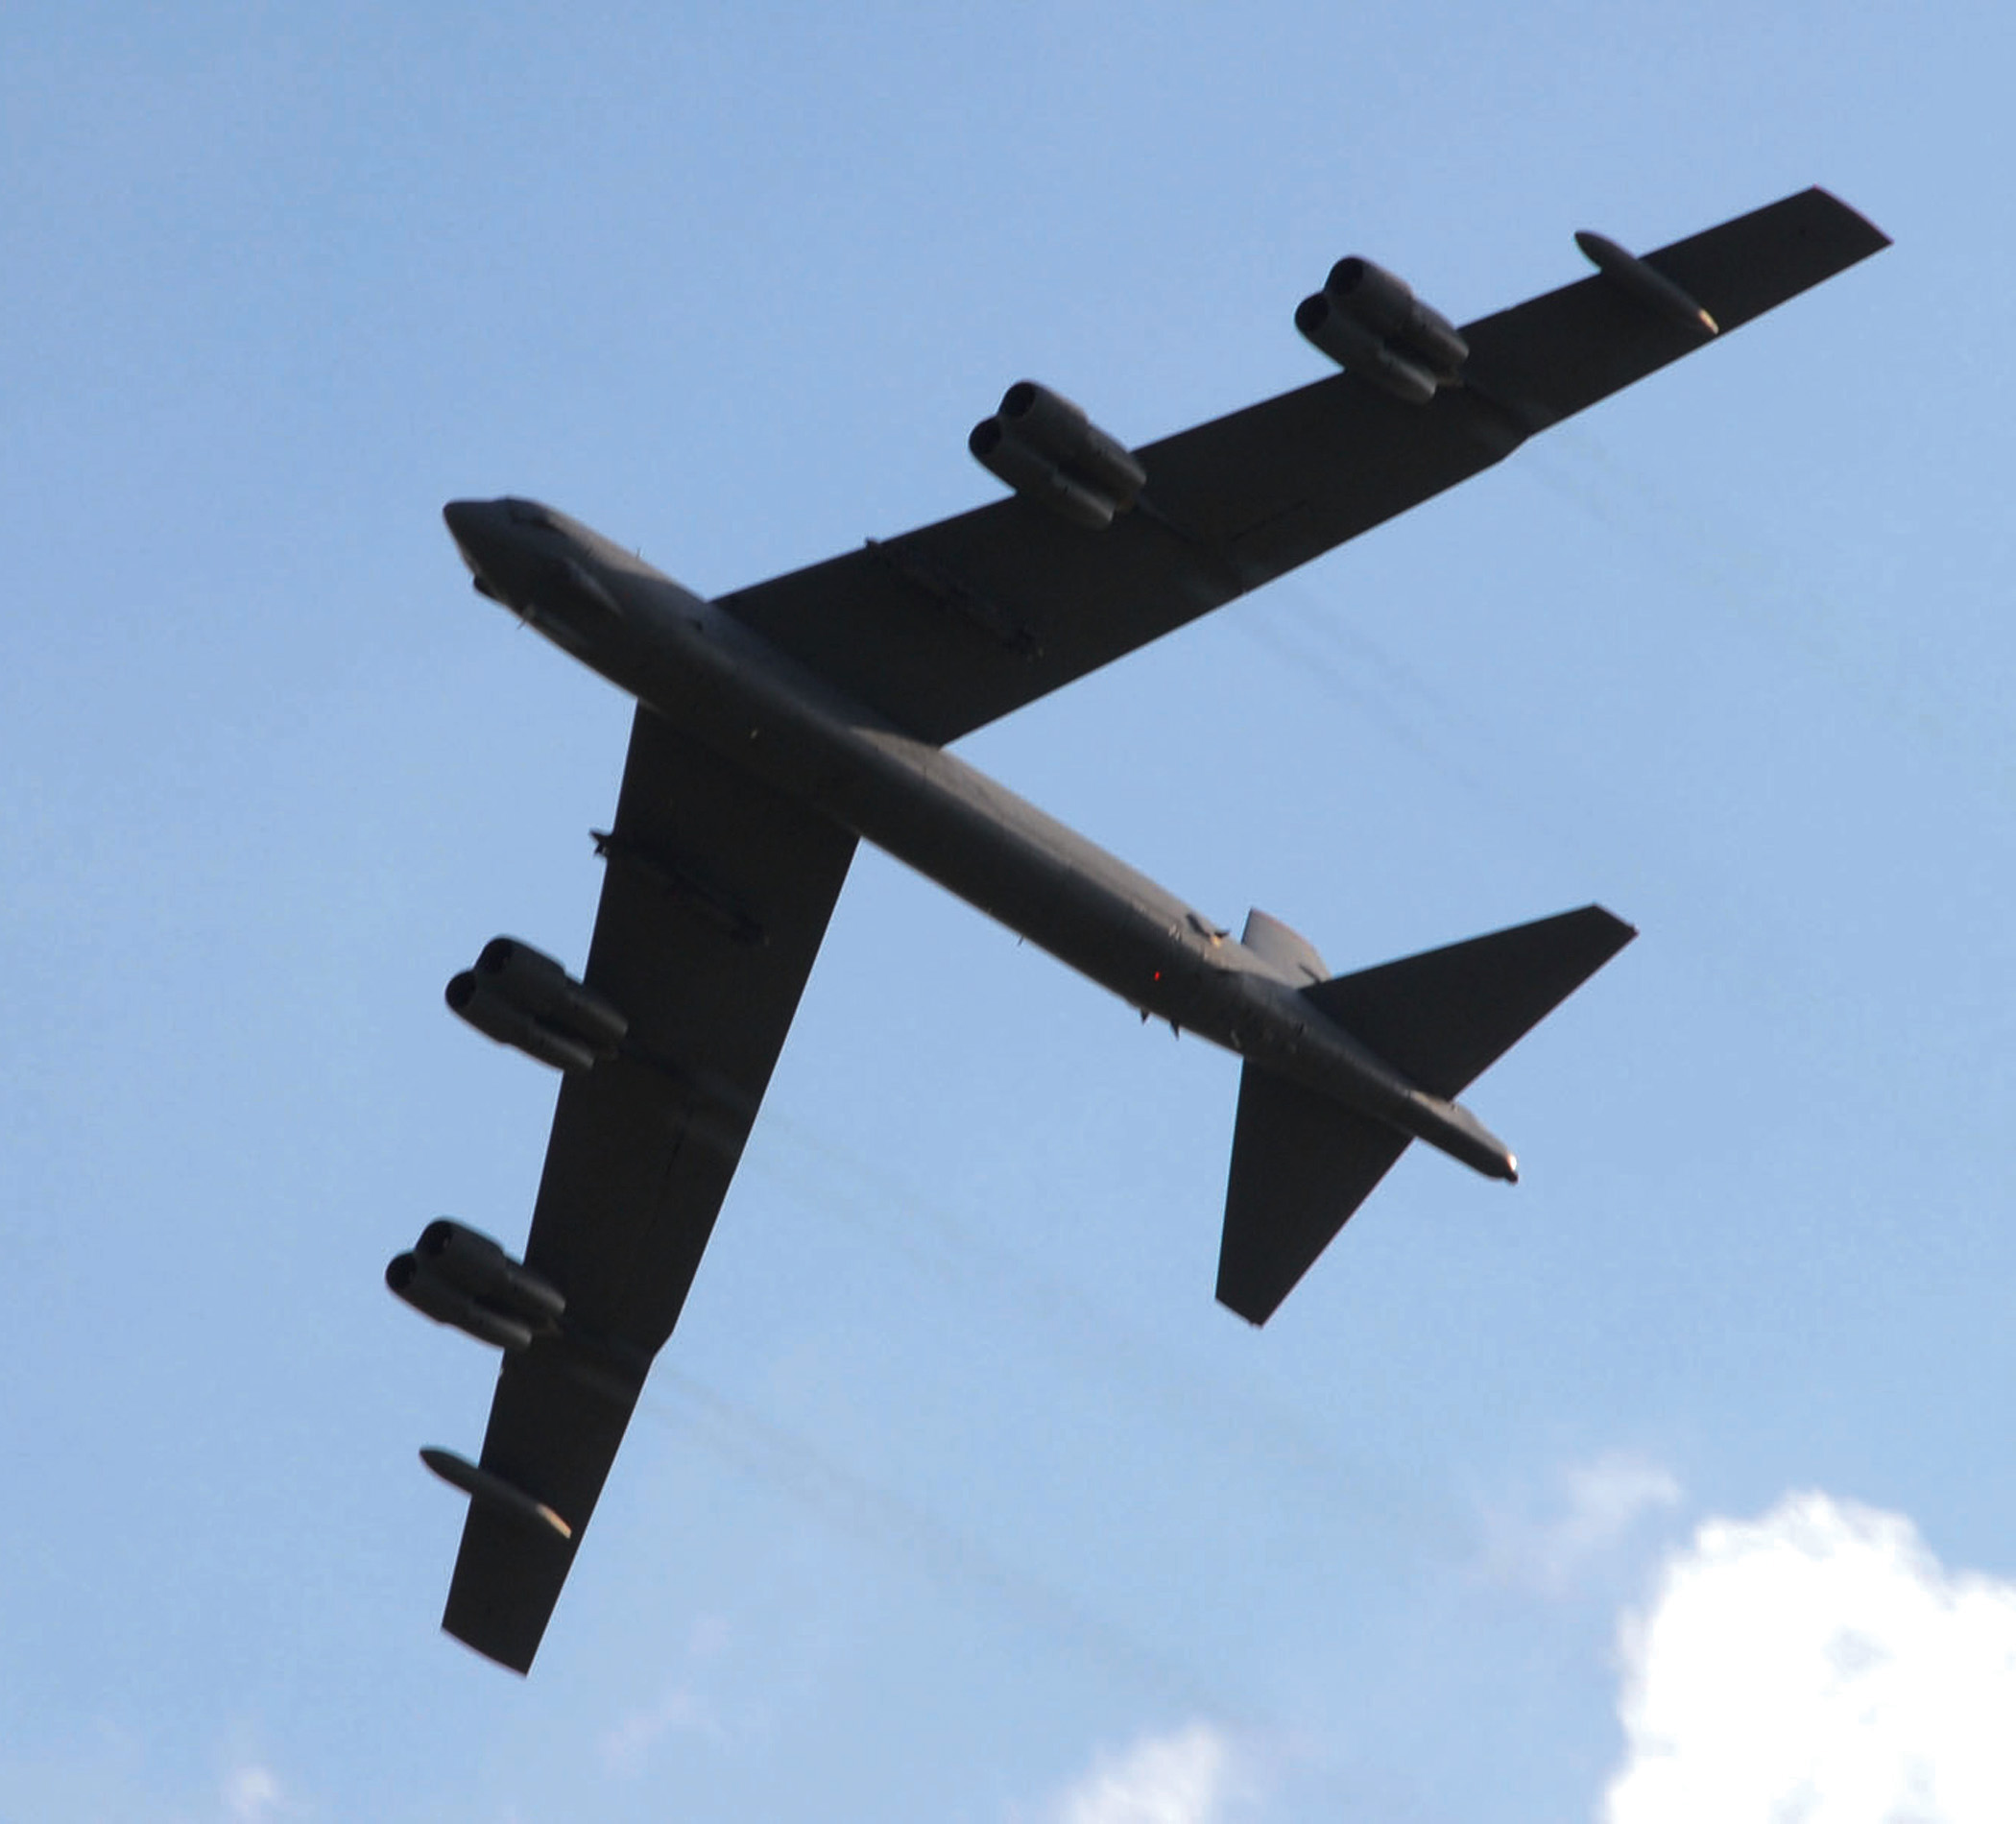 http://upload.wikimedia.org/wikipedia/commons/8/82/Boeing_B-52_Stratofortress_1.jpg